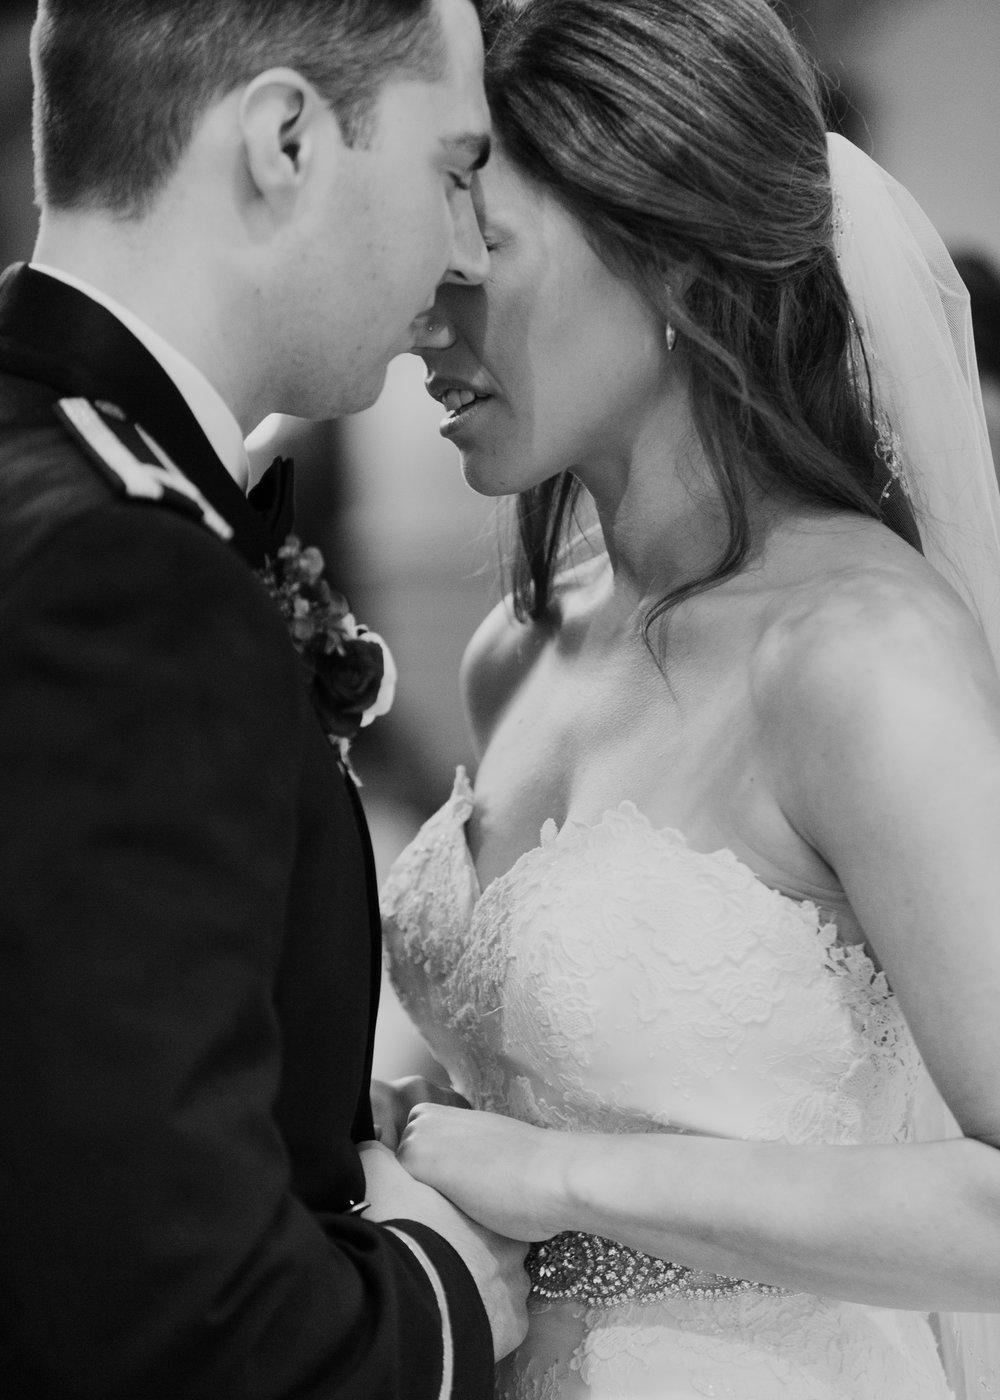 Colorado-Springs-Wedding-Photographer-33.jpg